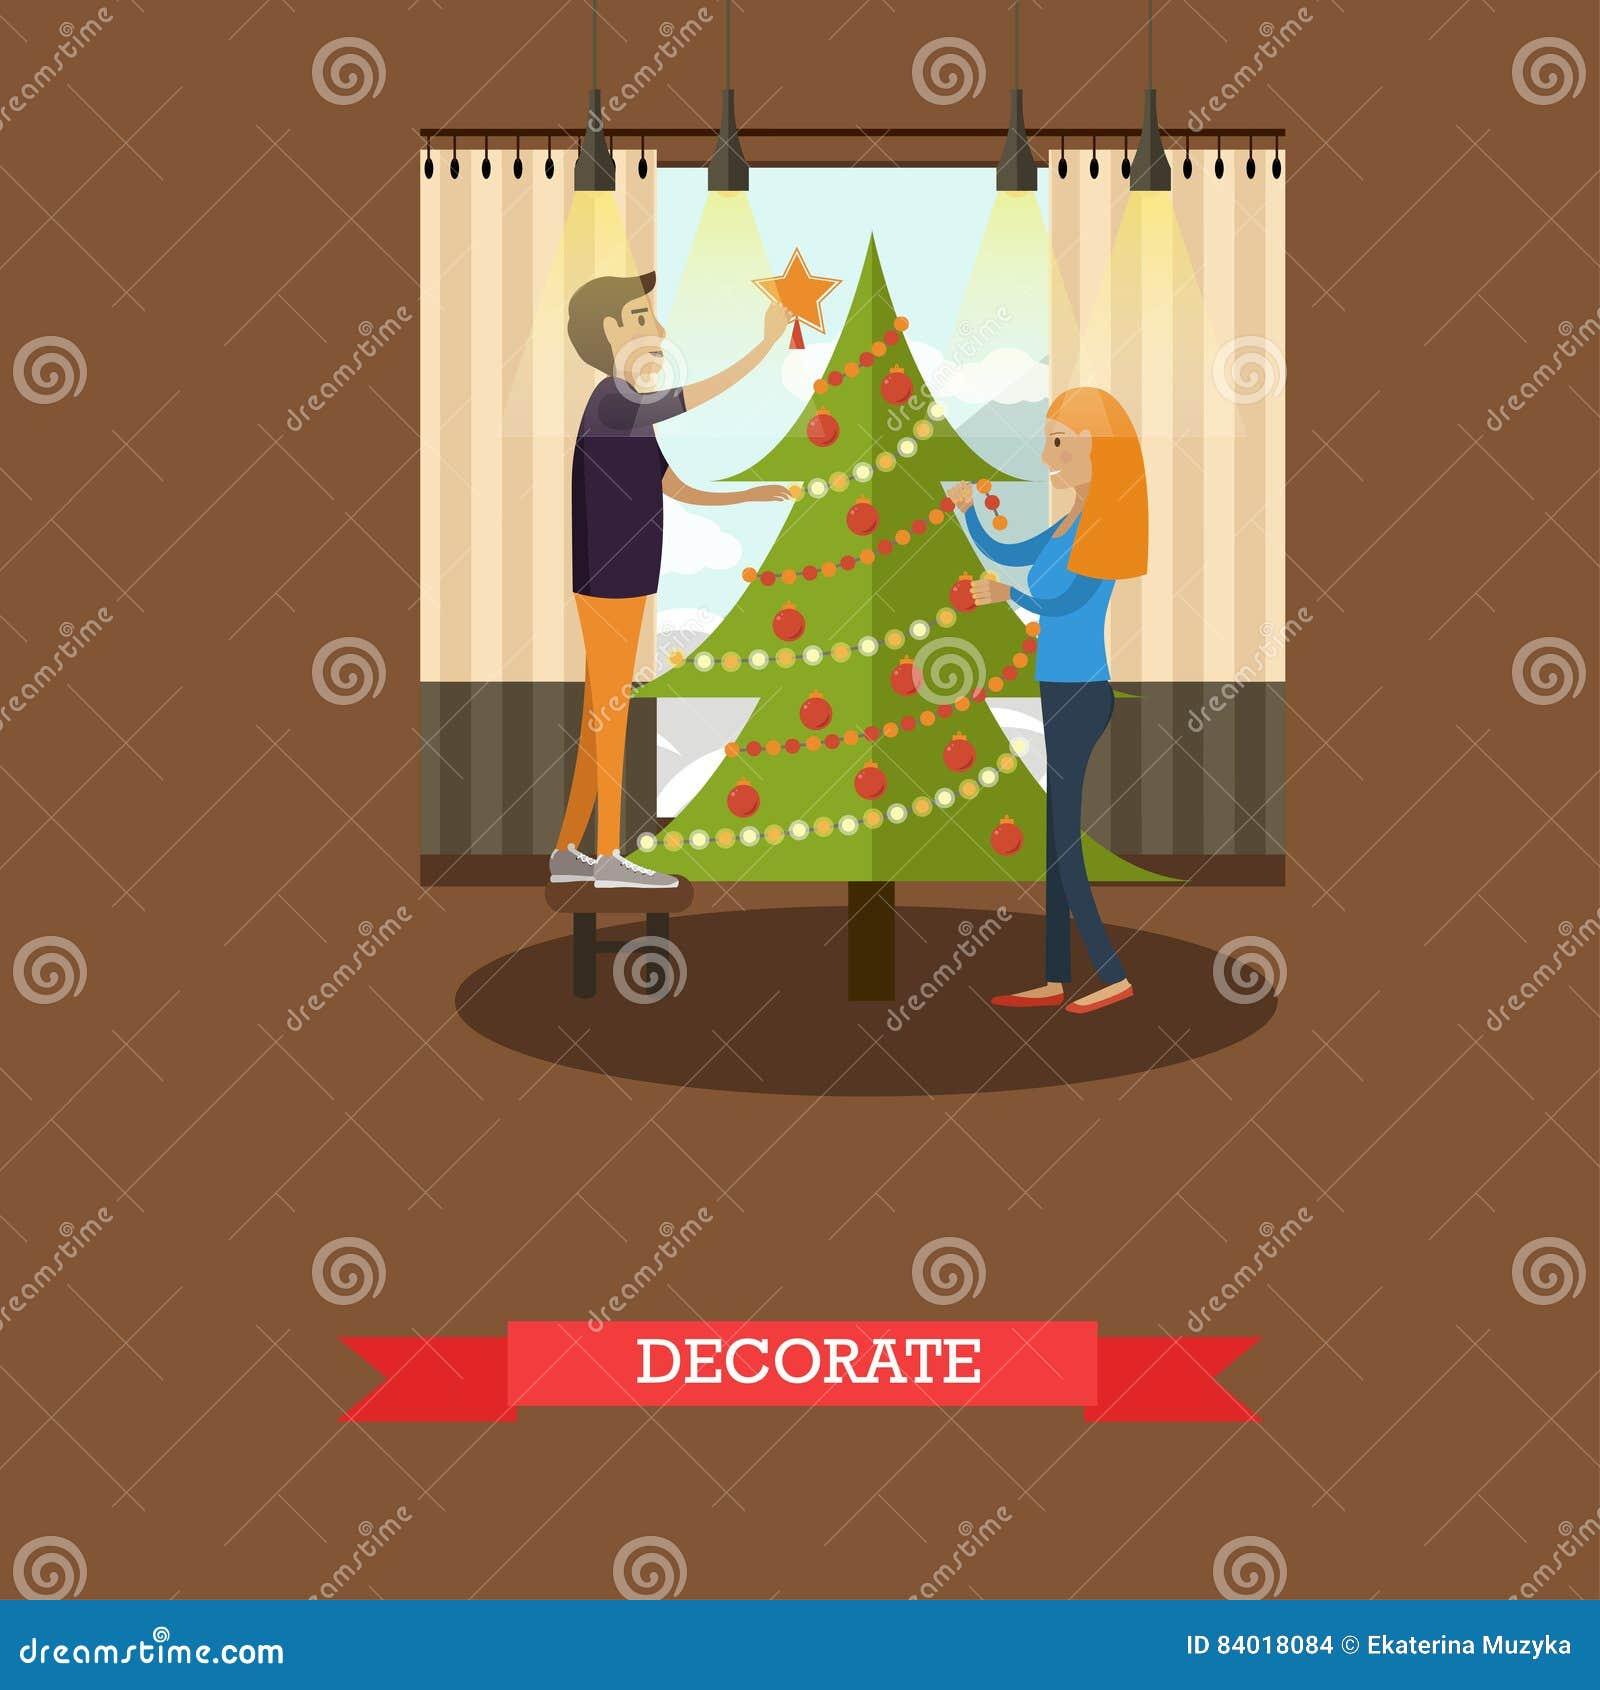 Christmas Tree Decoration Elements: Vector Illustration Of Christmas Tree Decoration Design